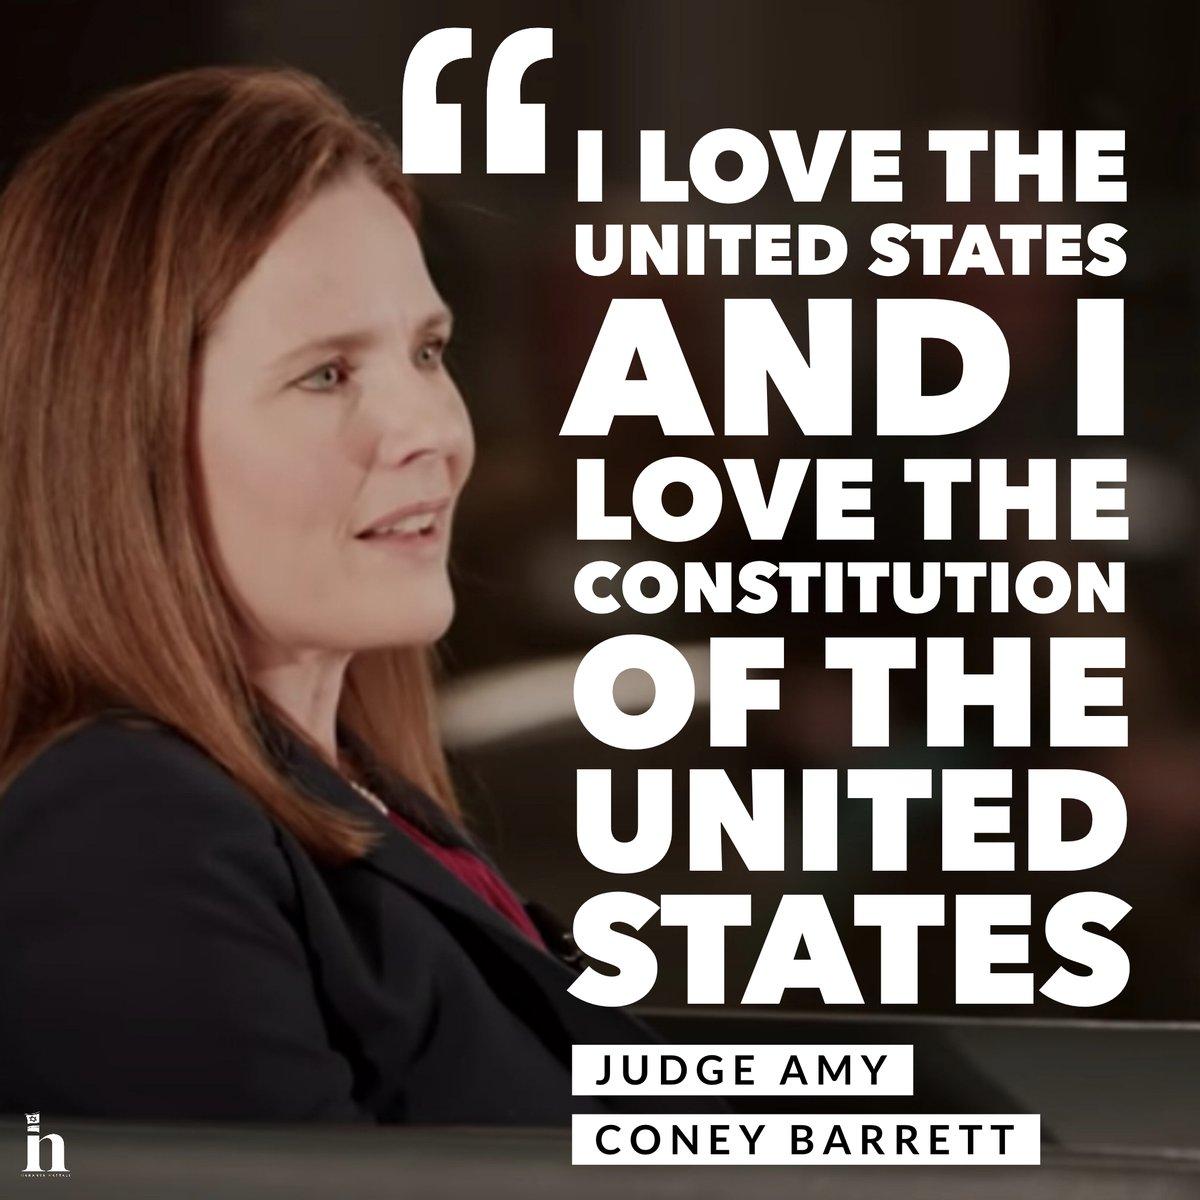 Amy Coney Barrett loves the United States of America! 🇺🇸 #AmyConeyBarrett https://t.co/eCrlYw2Wg9